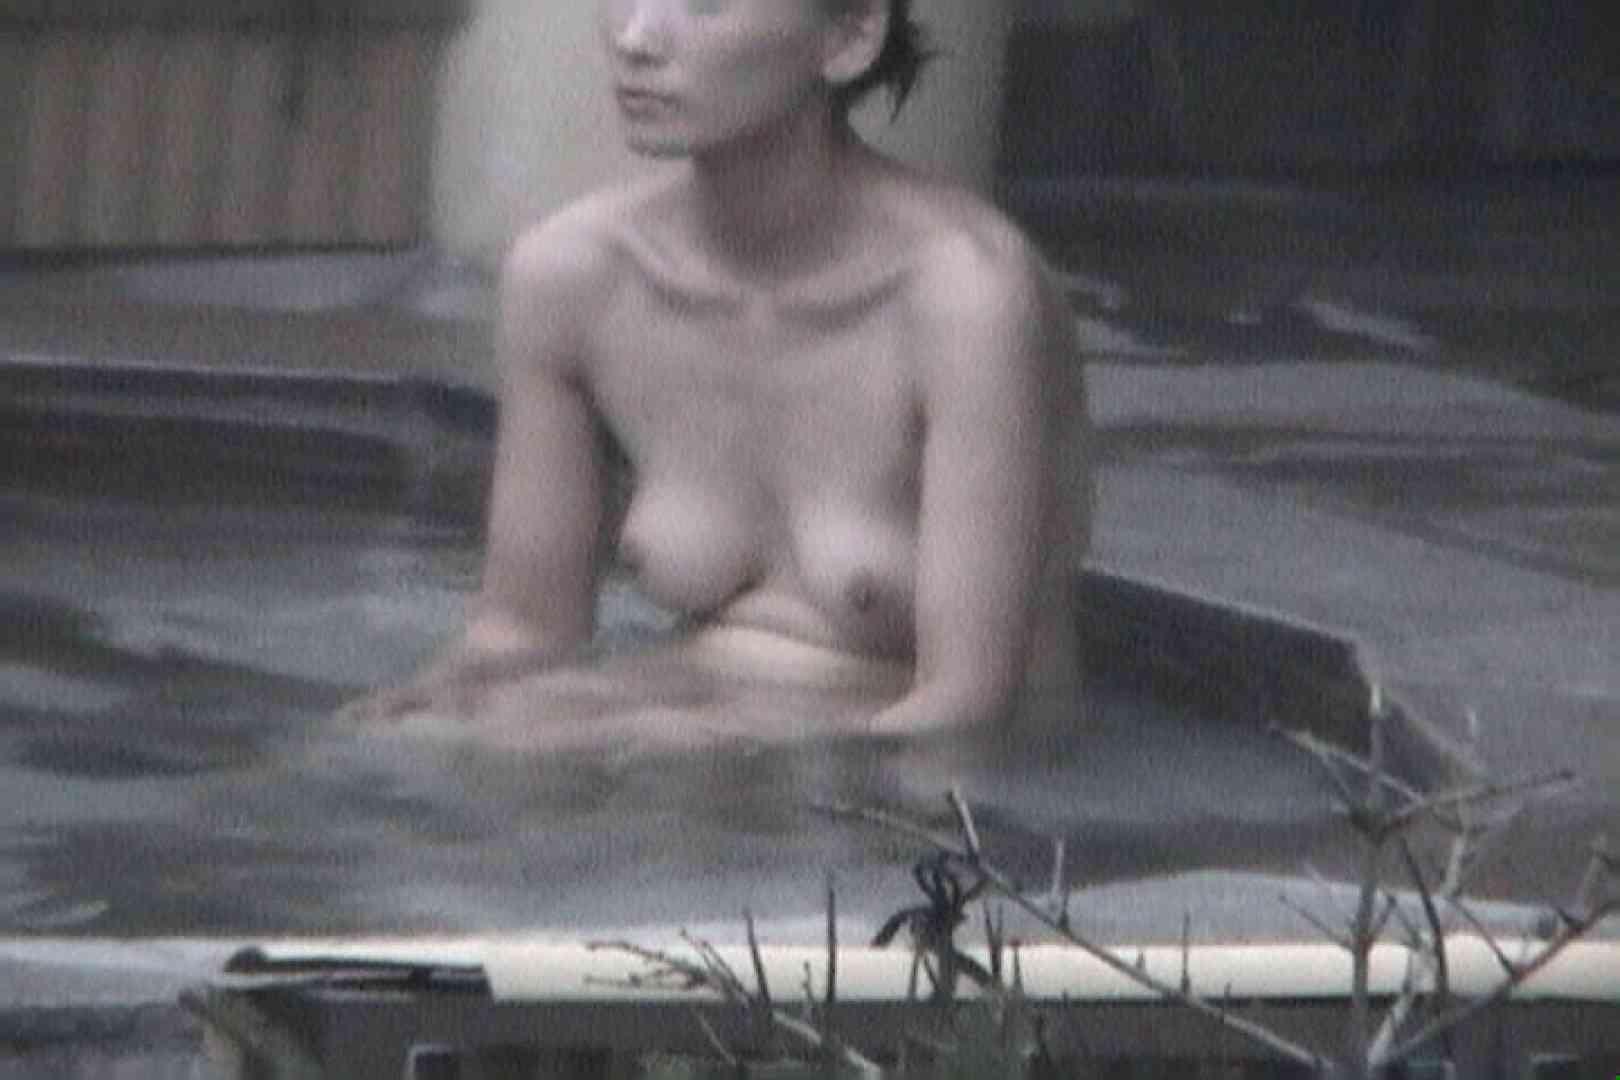 Aquaな露天風呂Vol.557 綺麗なOLたち  78枚 18